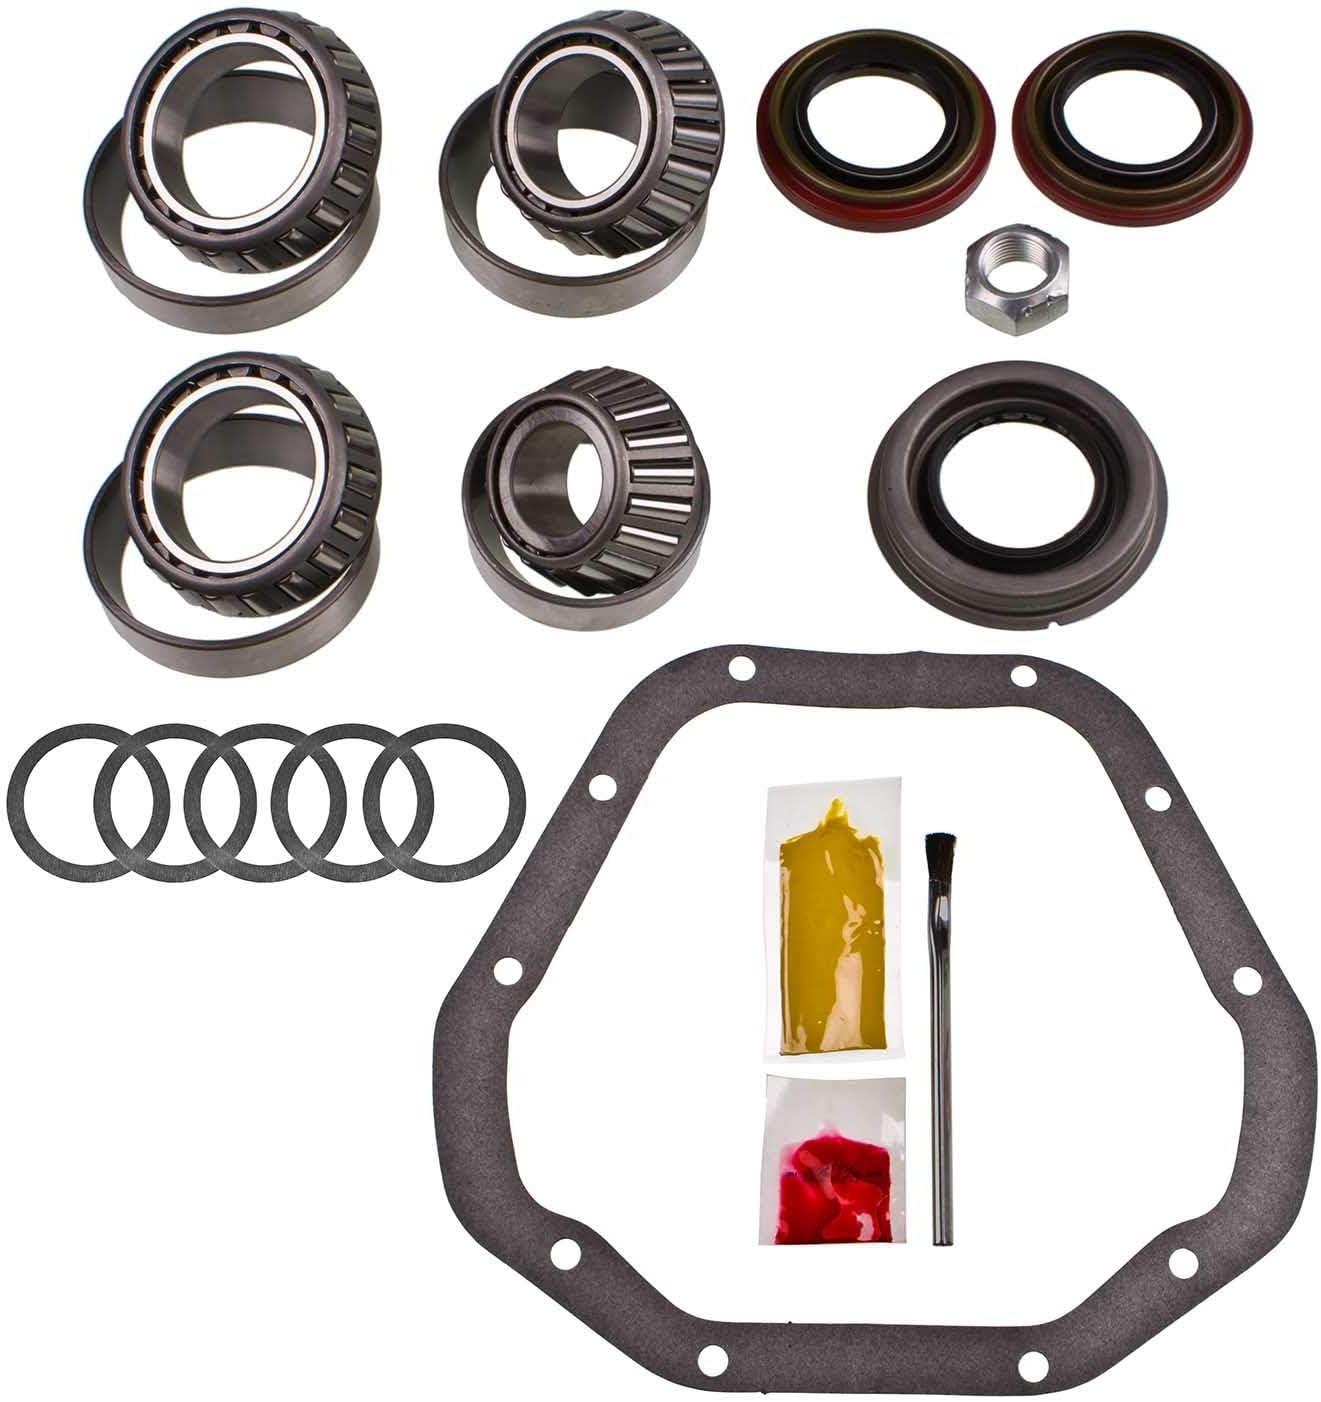 Dana 70U Motive Gear R70UR Bearing Kit with Koyo Bearings